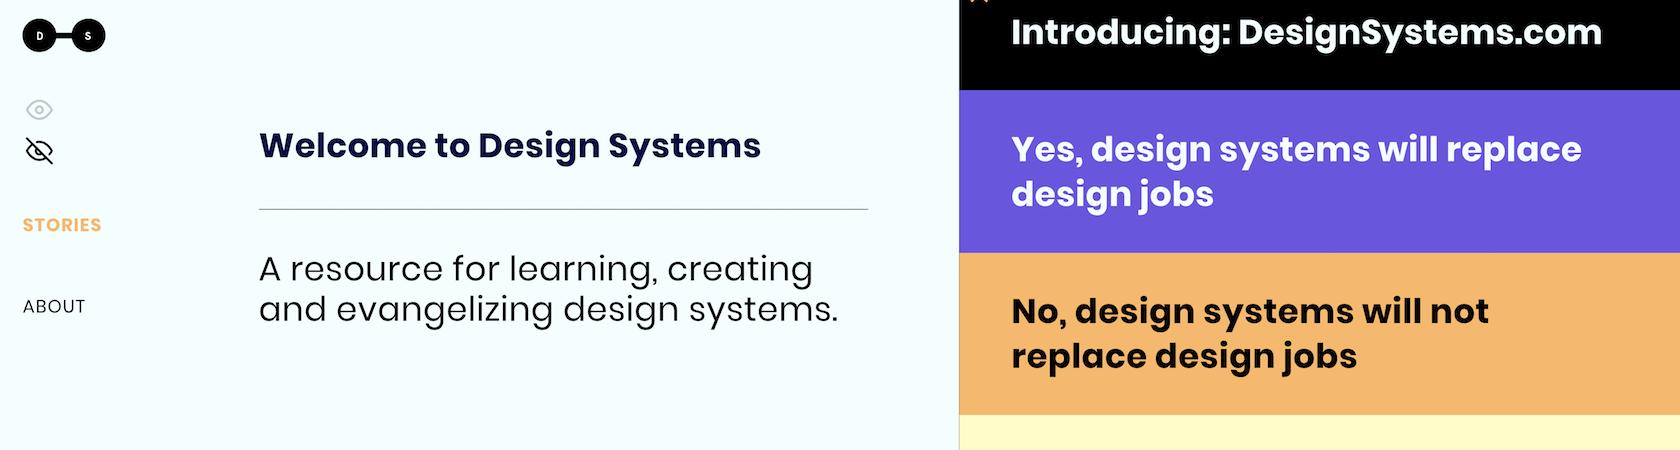 Design System design news